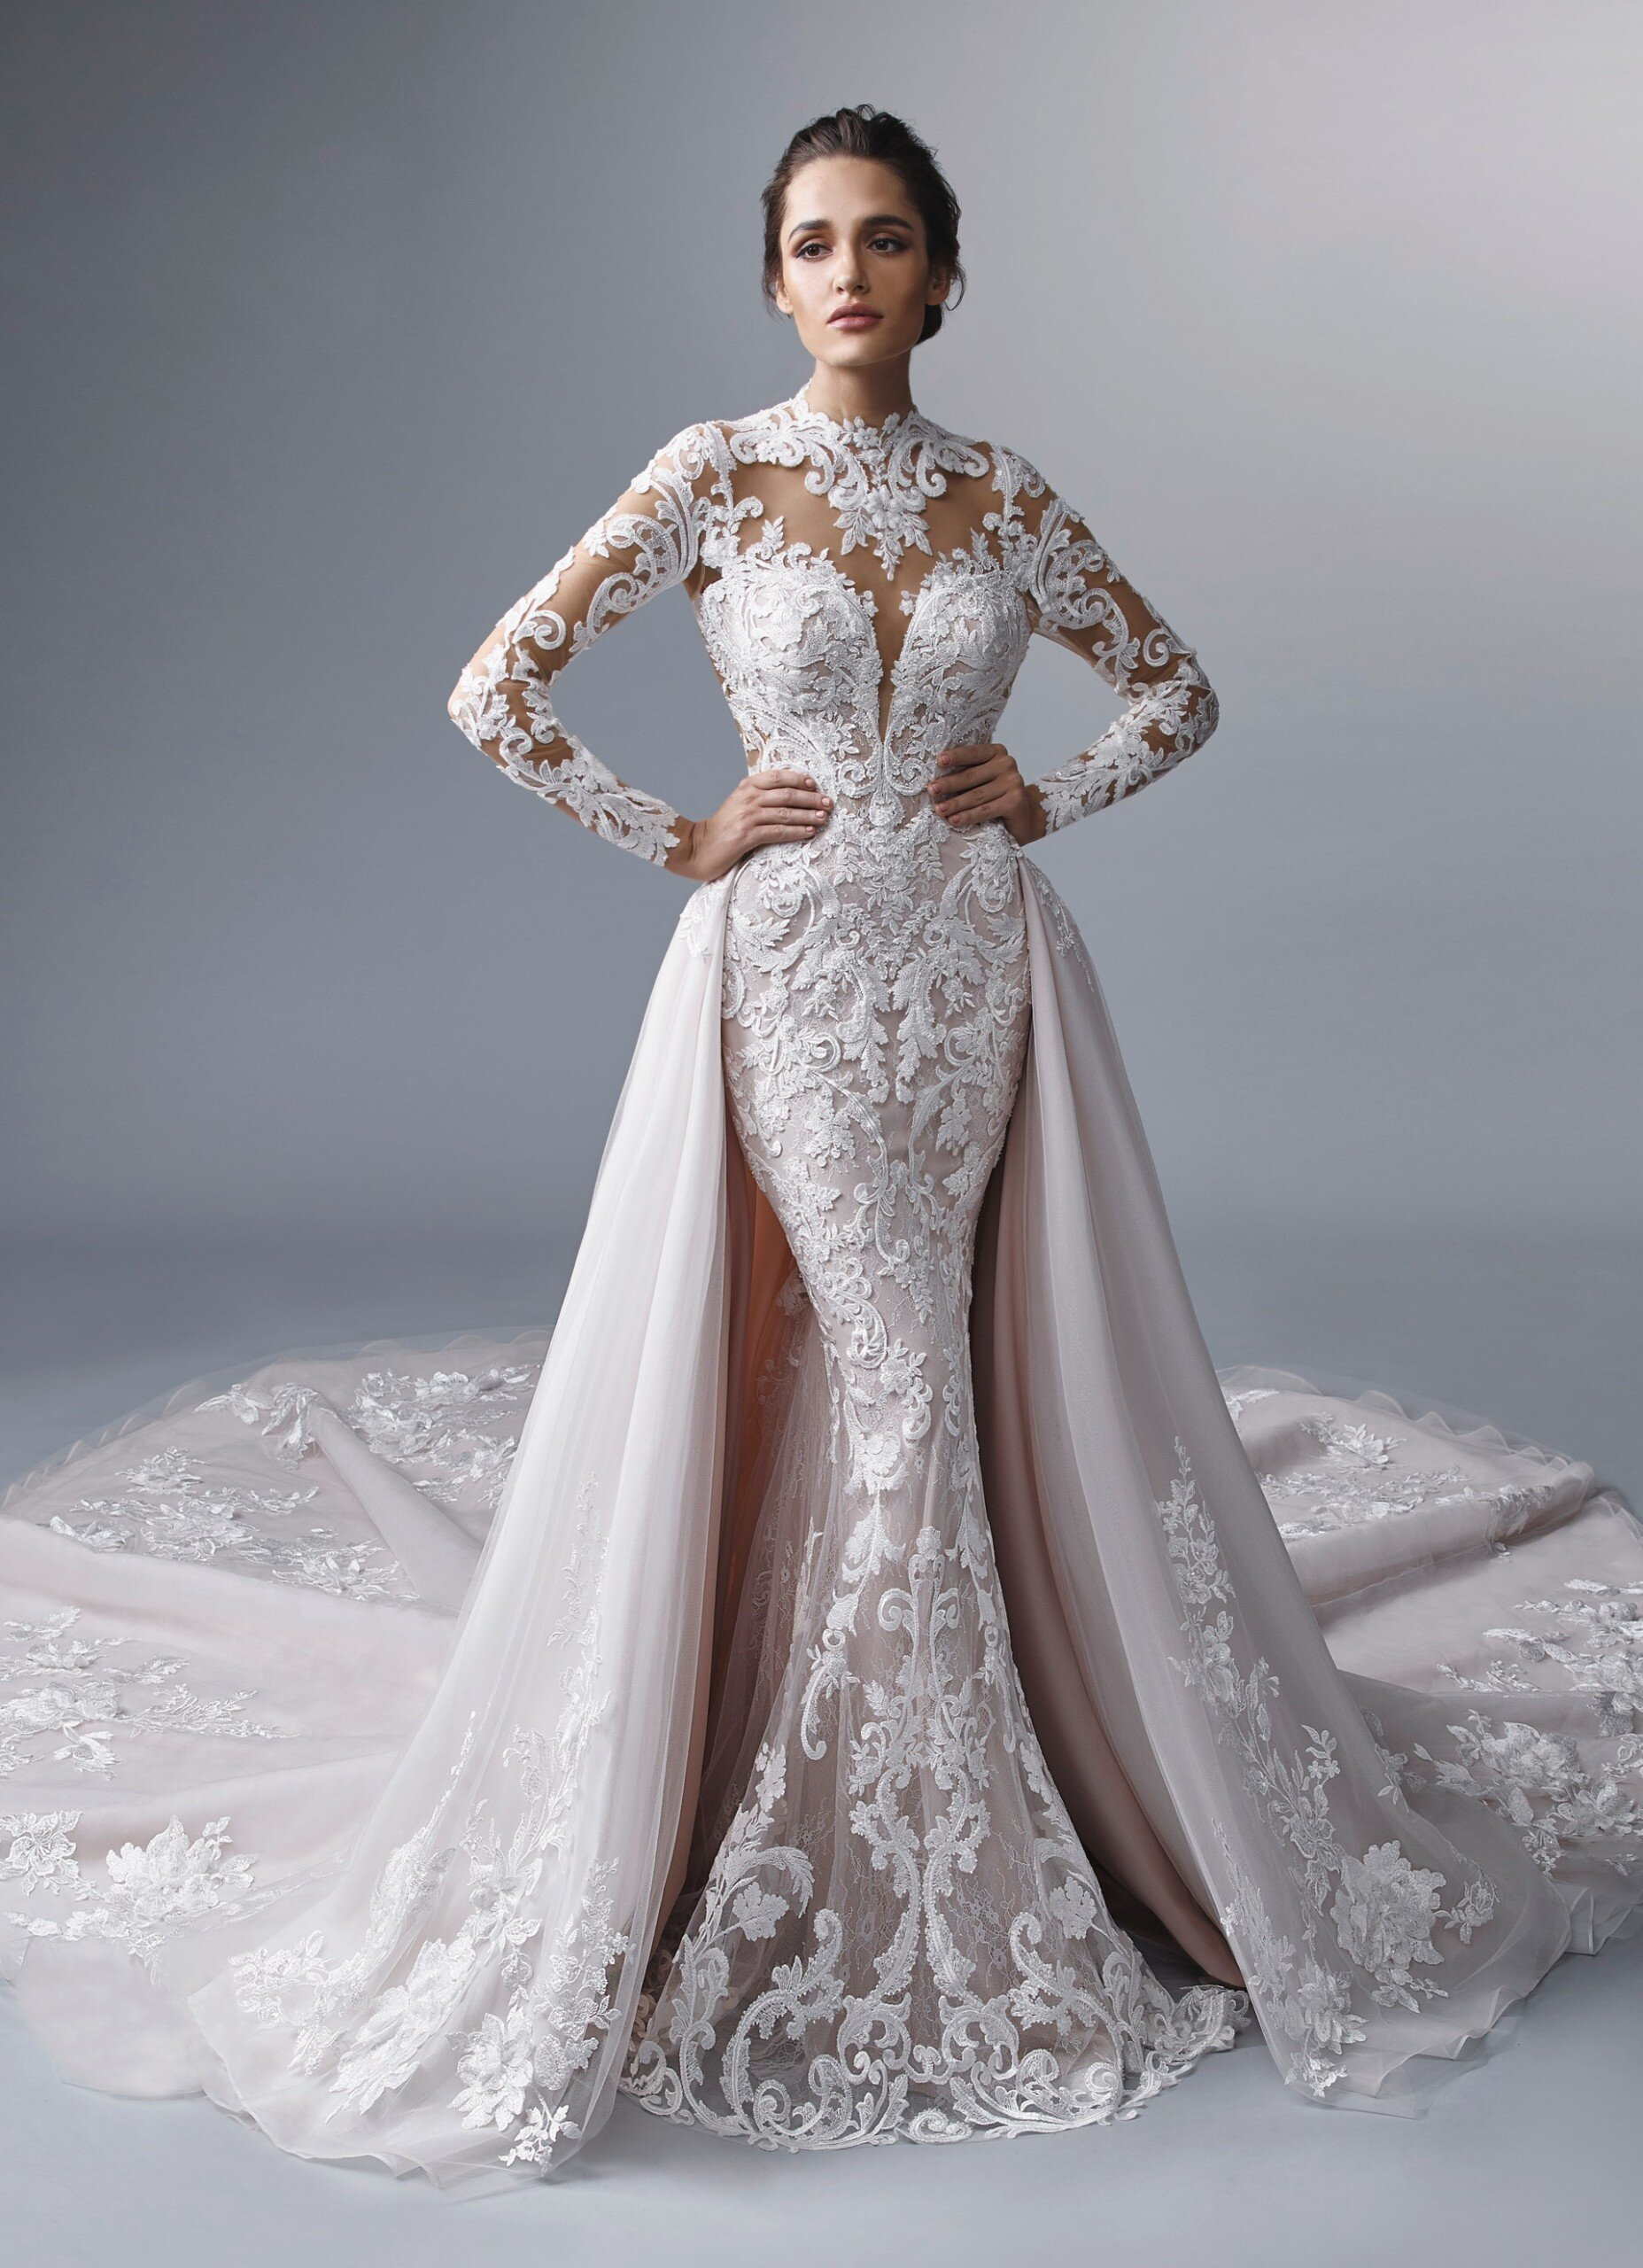 Elysée Atelier Brautmode Kollektion 2021 Modell Kohinoor